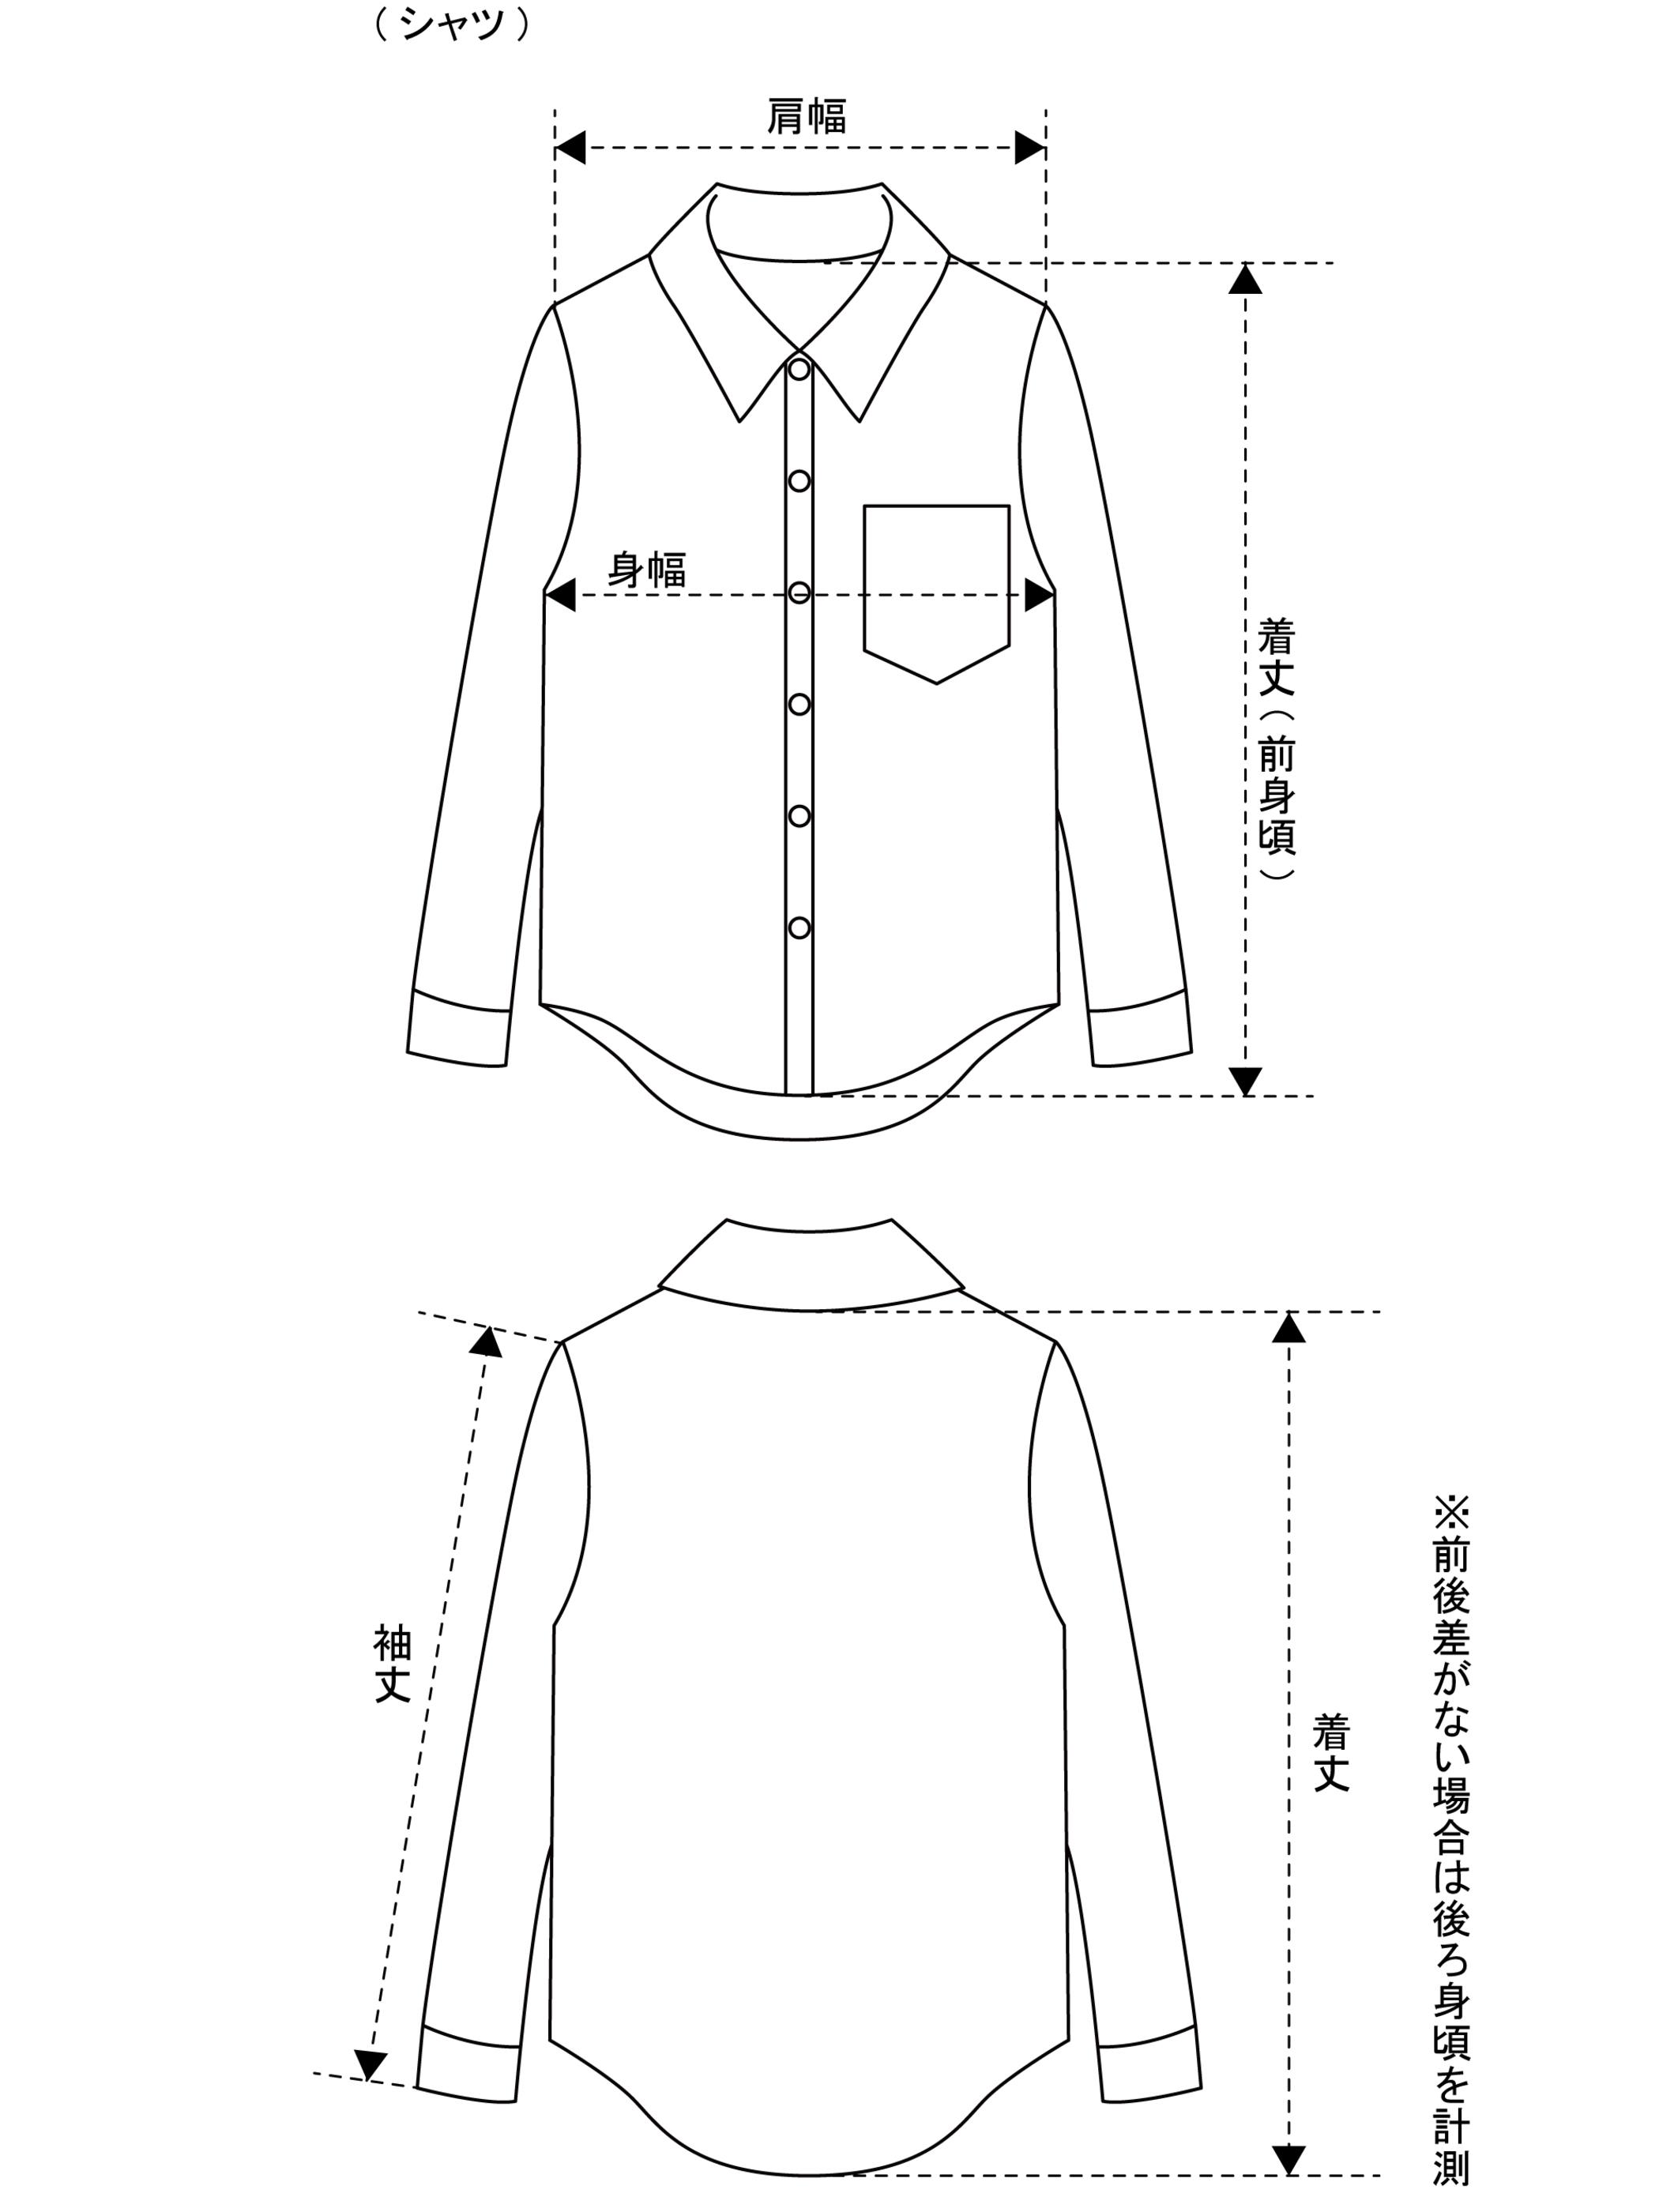 1970's / vintage Bellcraft pattern shirt